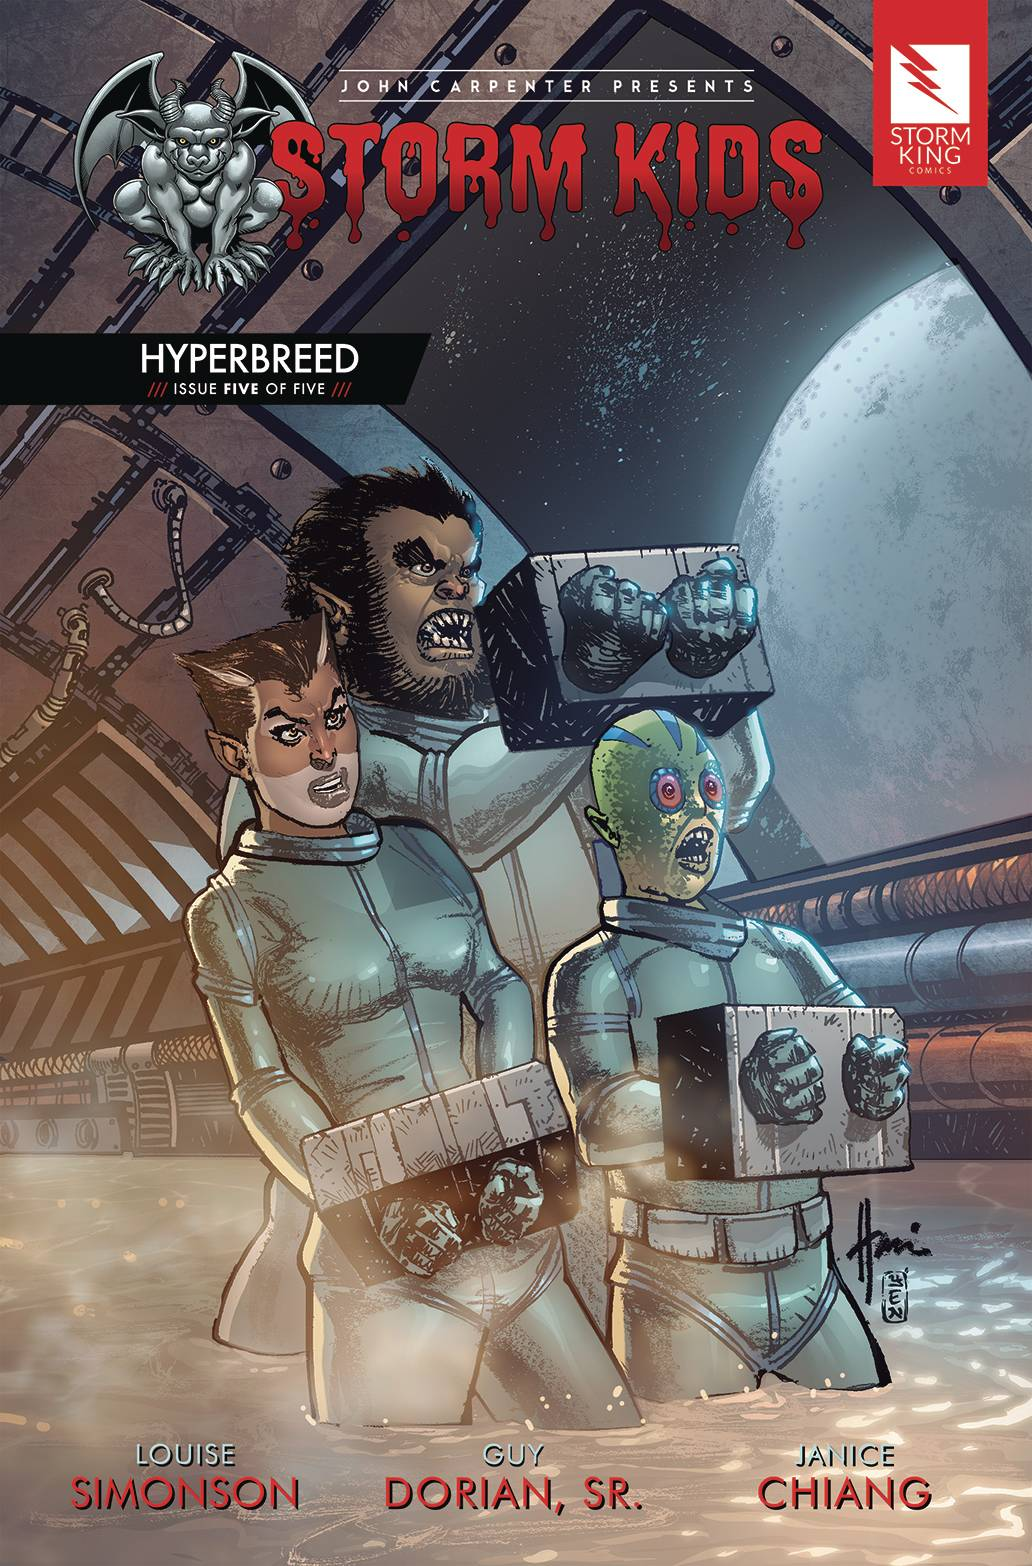 Storm Kids: Hyperbreed #5 (2020)